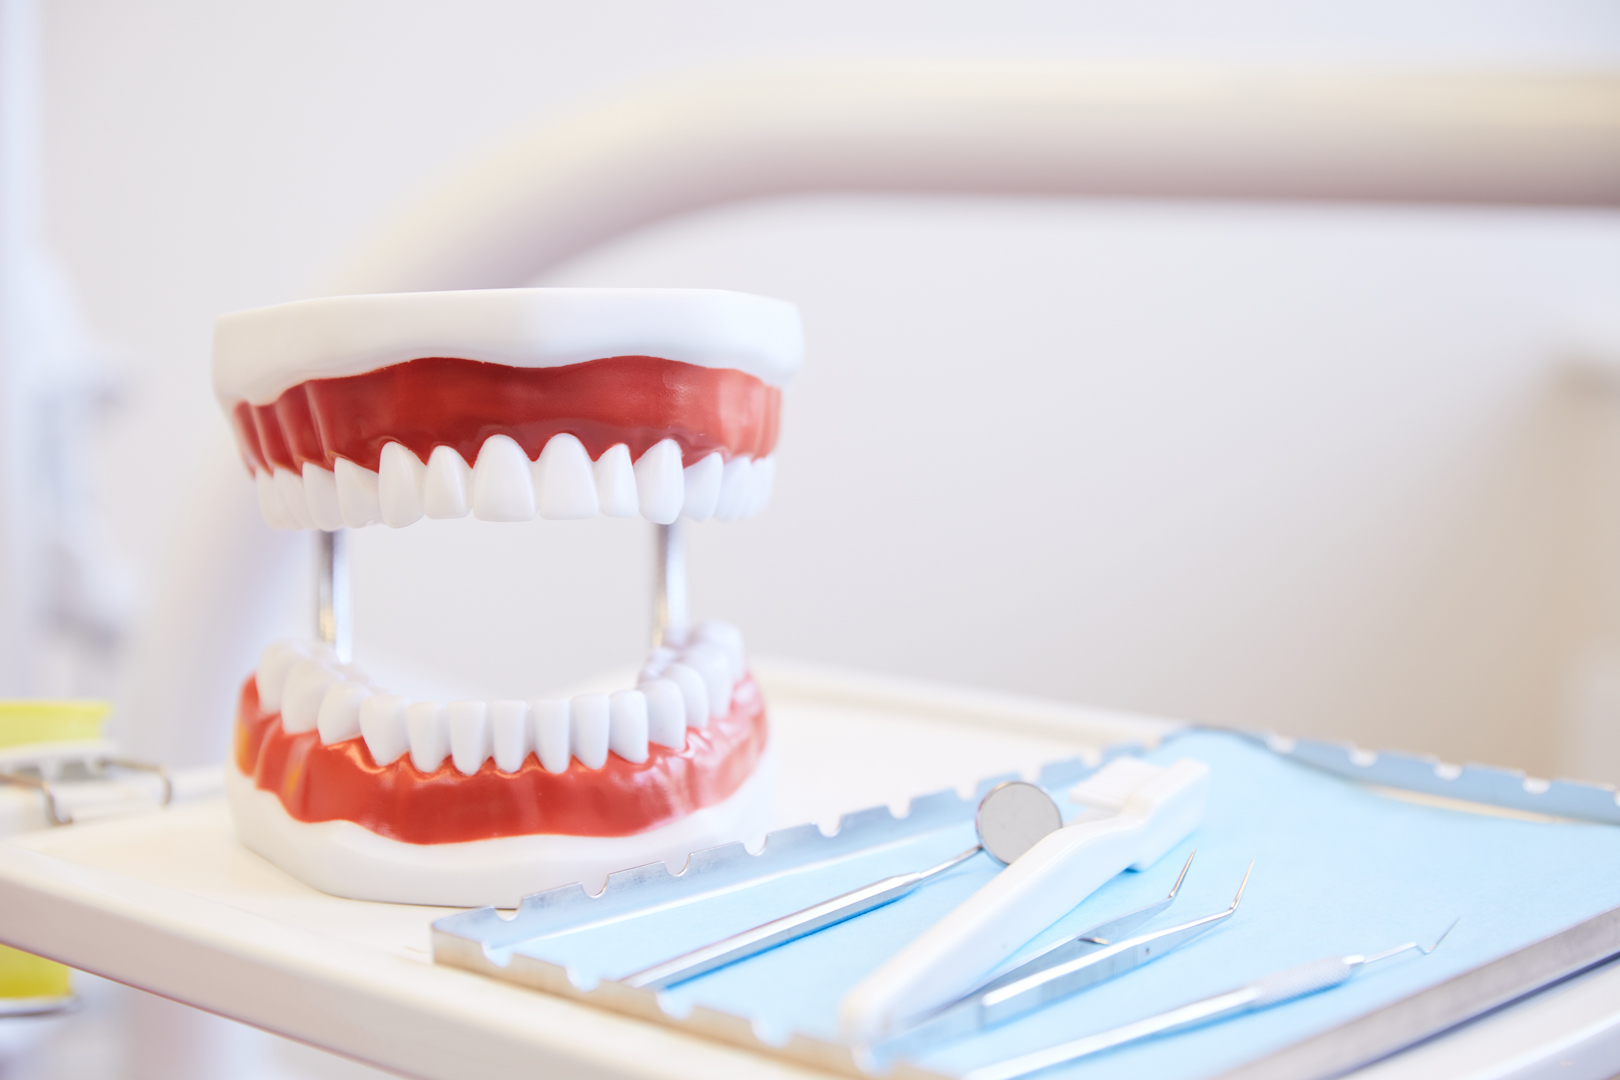 Zahnarztpraxis Innenaufnahmen